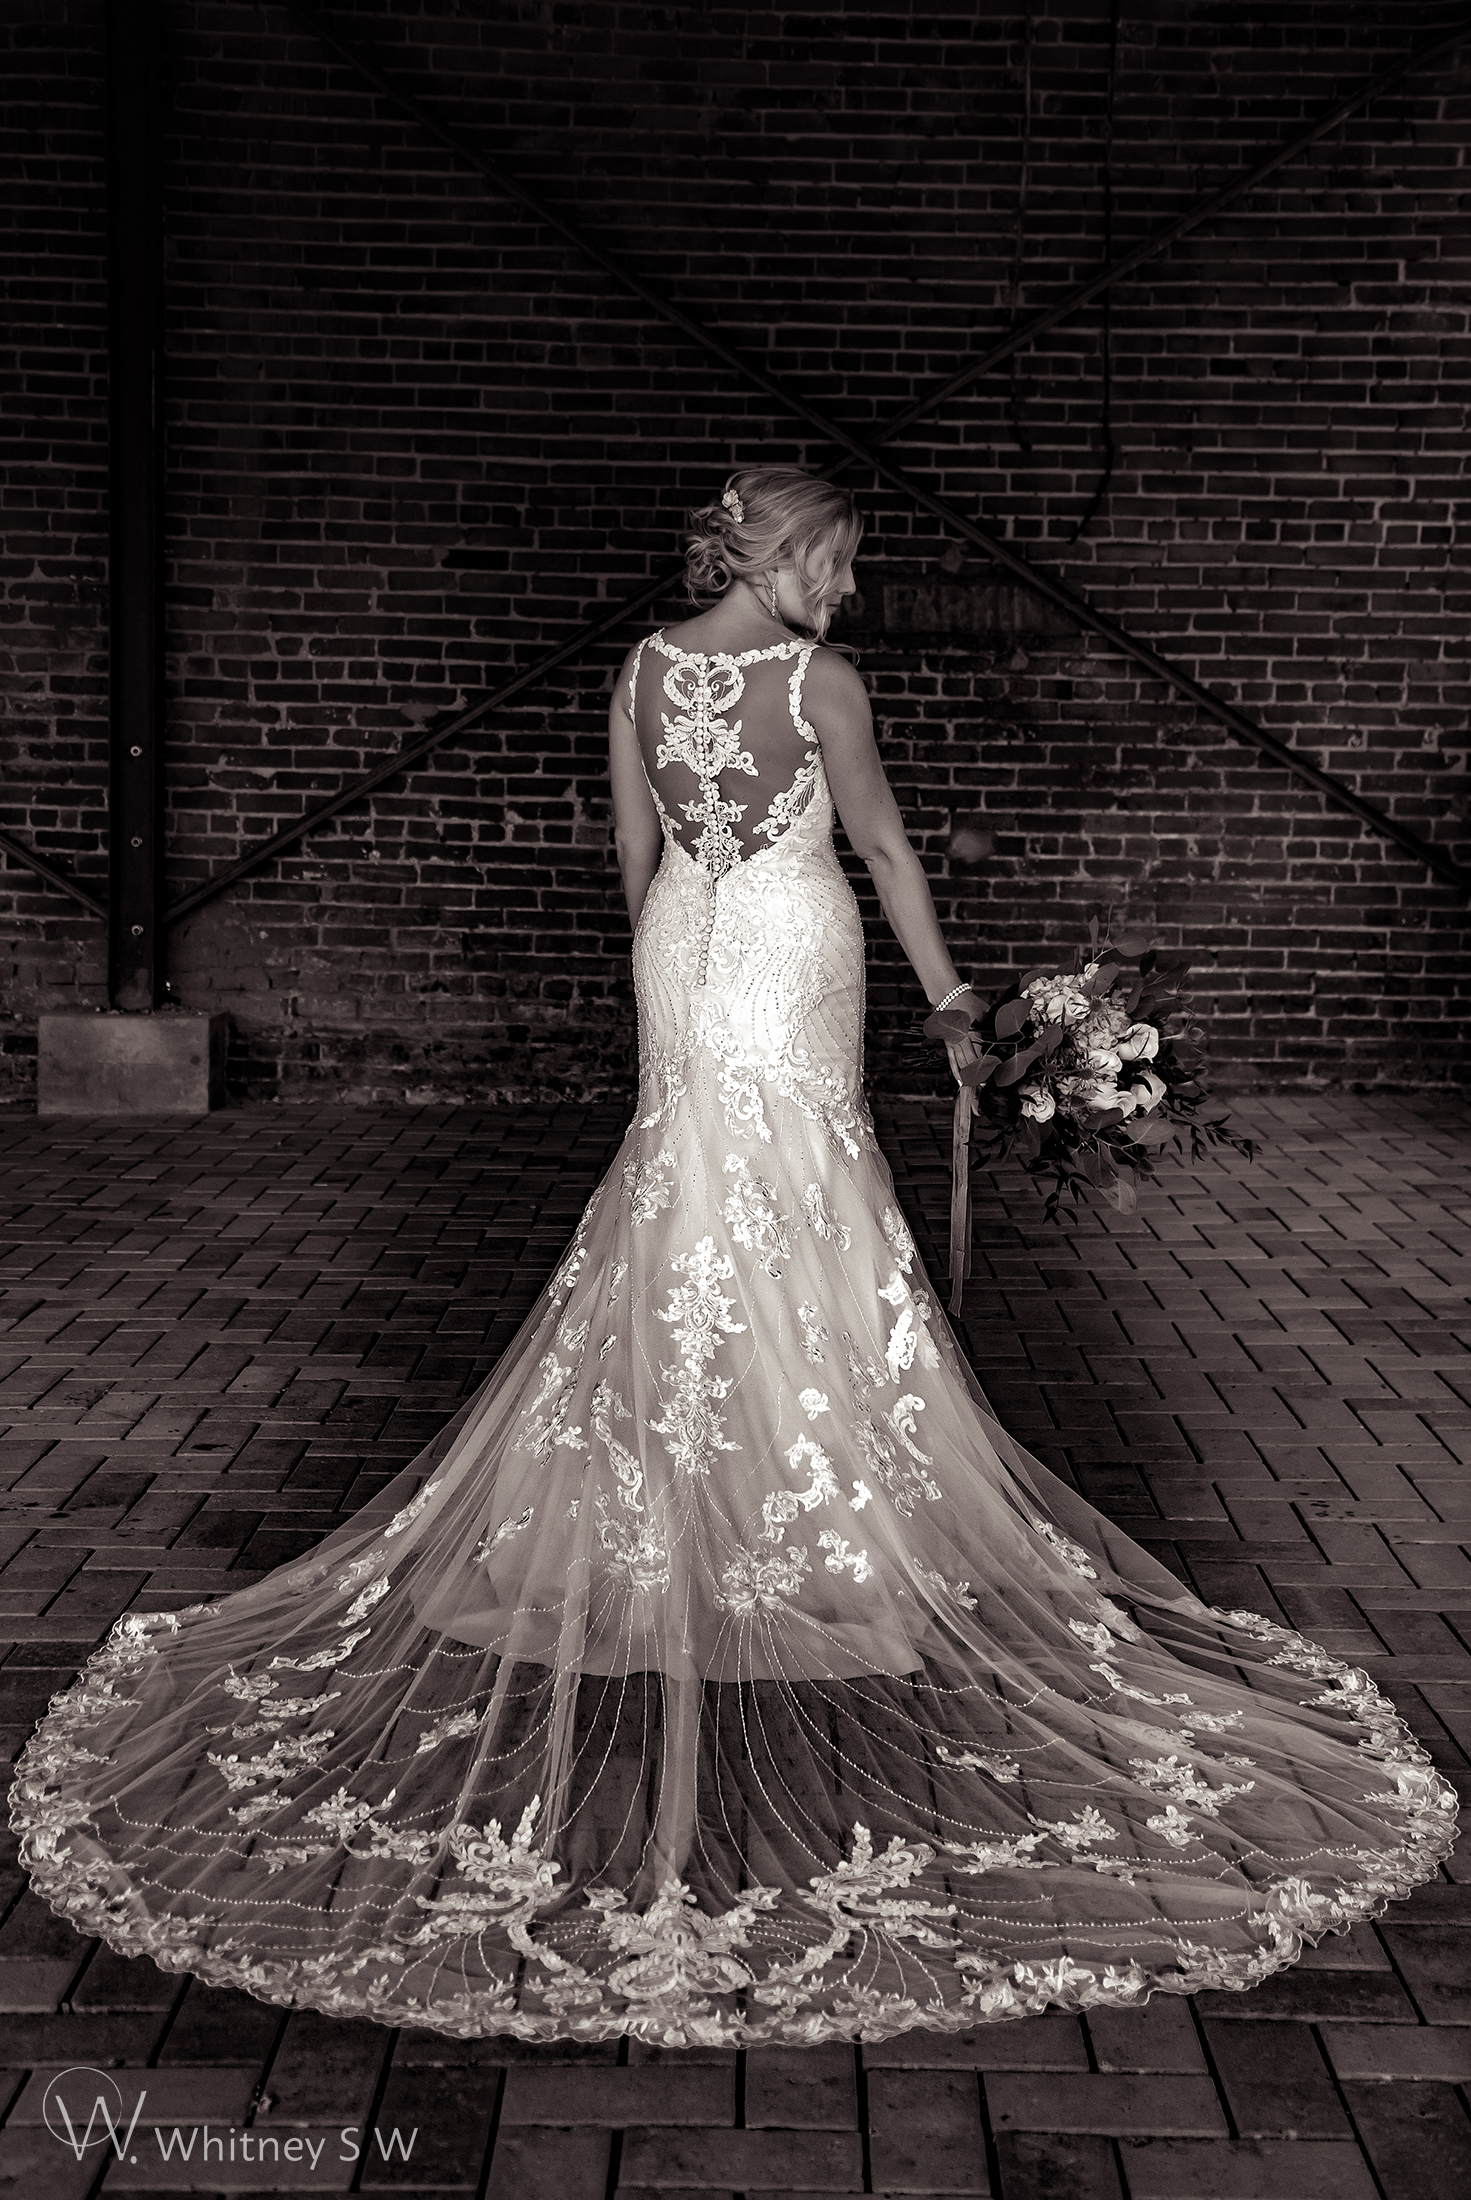 Morgan & Kaivon Wedding - Photography by Whitney S Williams whitneysw (38).jpg